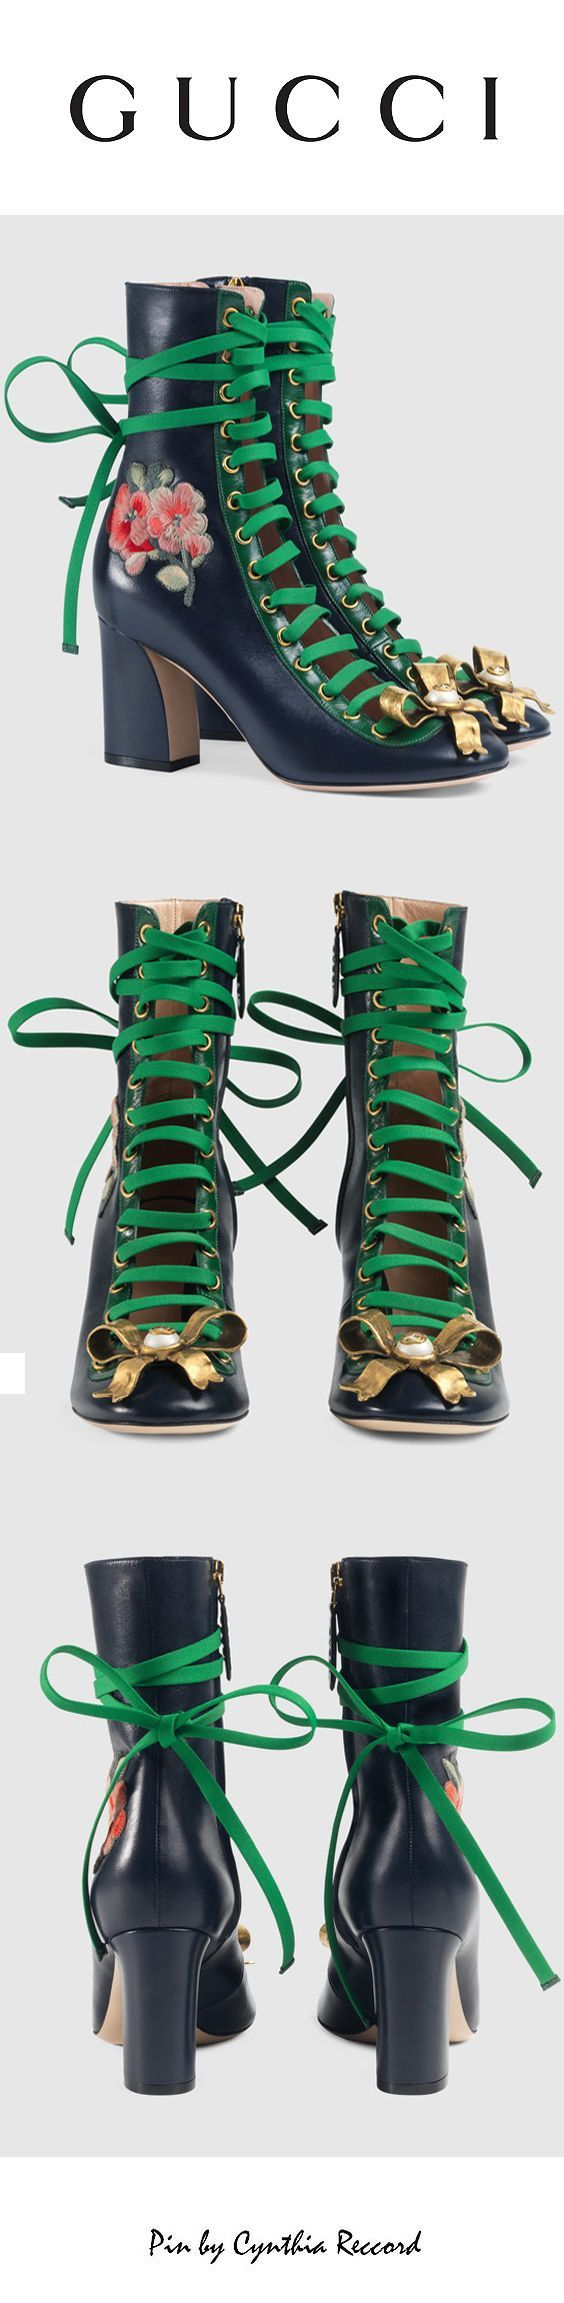 Gucci | SS 2016 Collection | cynthia reccord